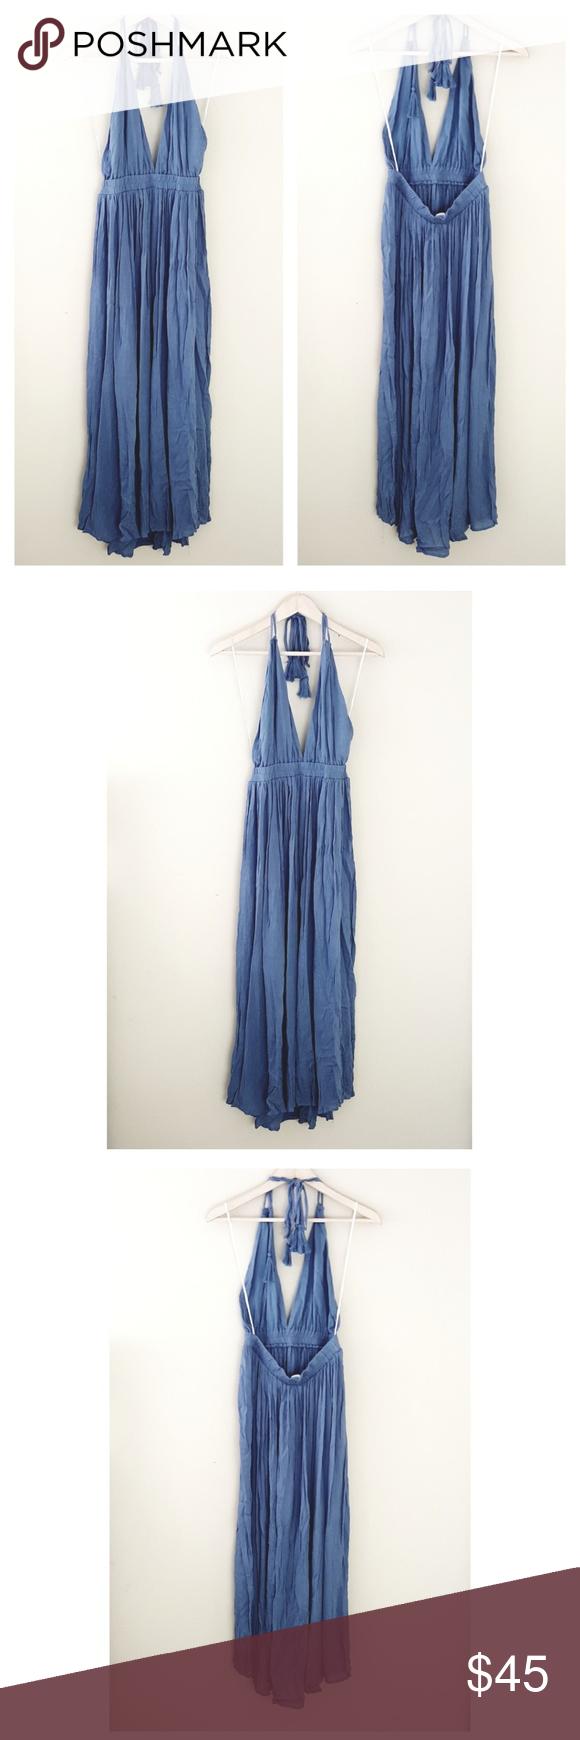 Gauzy denim blue openback boho halter maxi dress boutique in